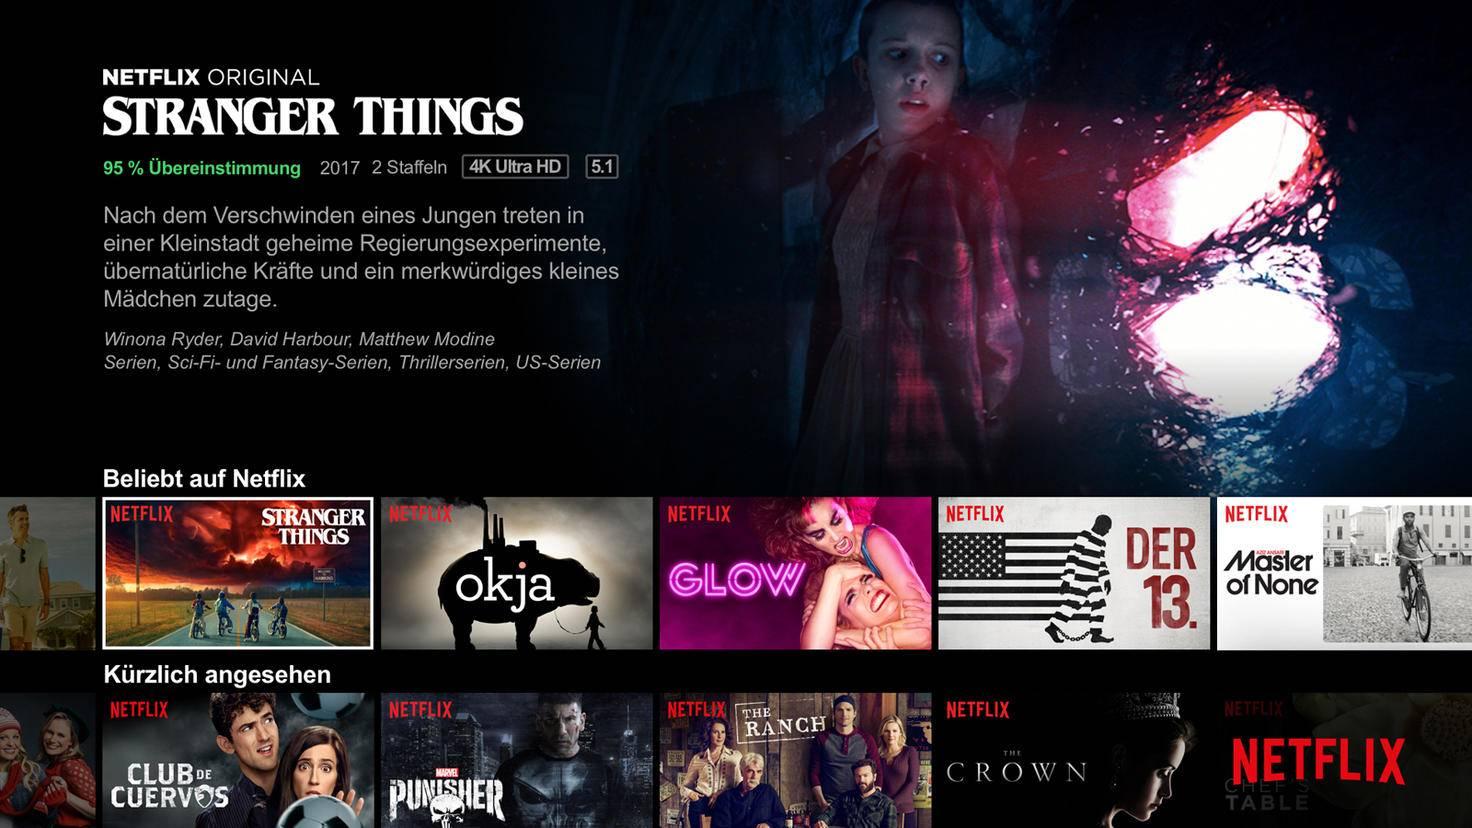 Netflix Screen Image